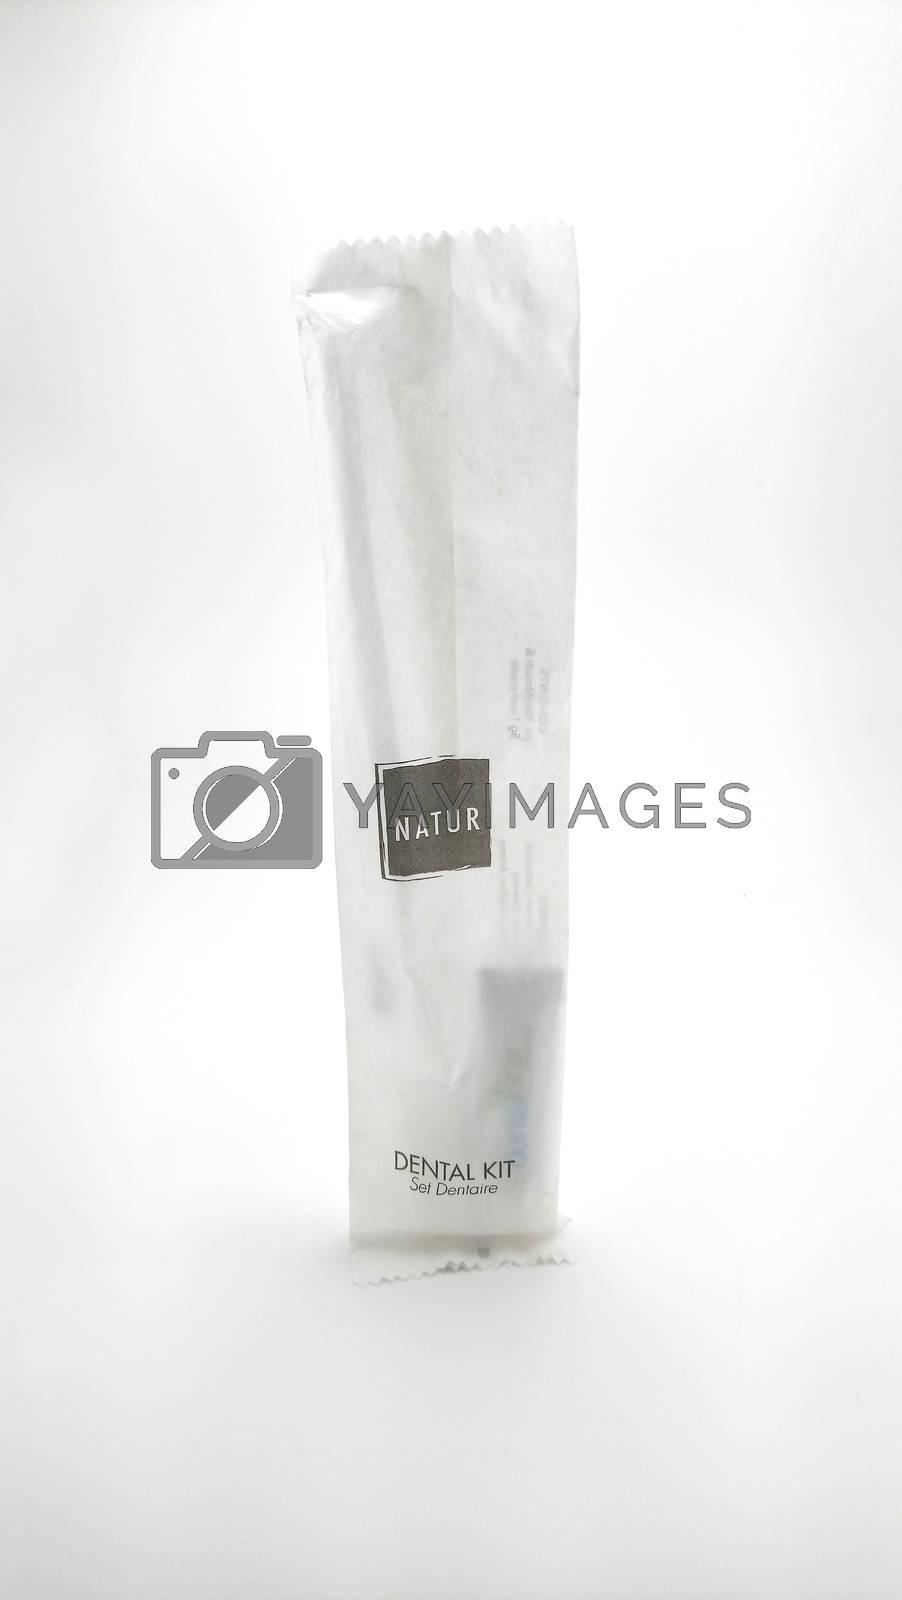 MANILA, PH - JUNE 23 - Natur dental kit on June 23, 2020 in Manila, Philippines.